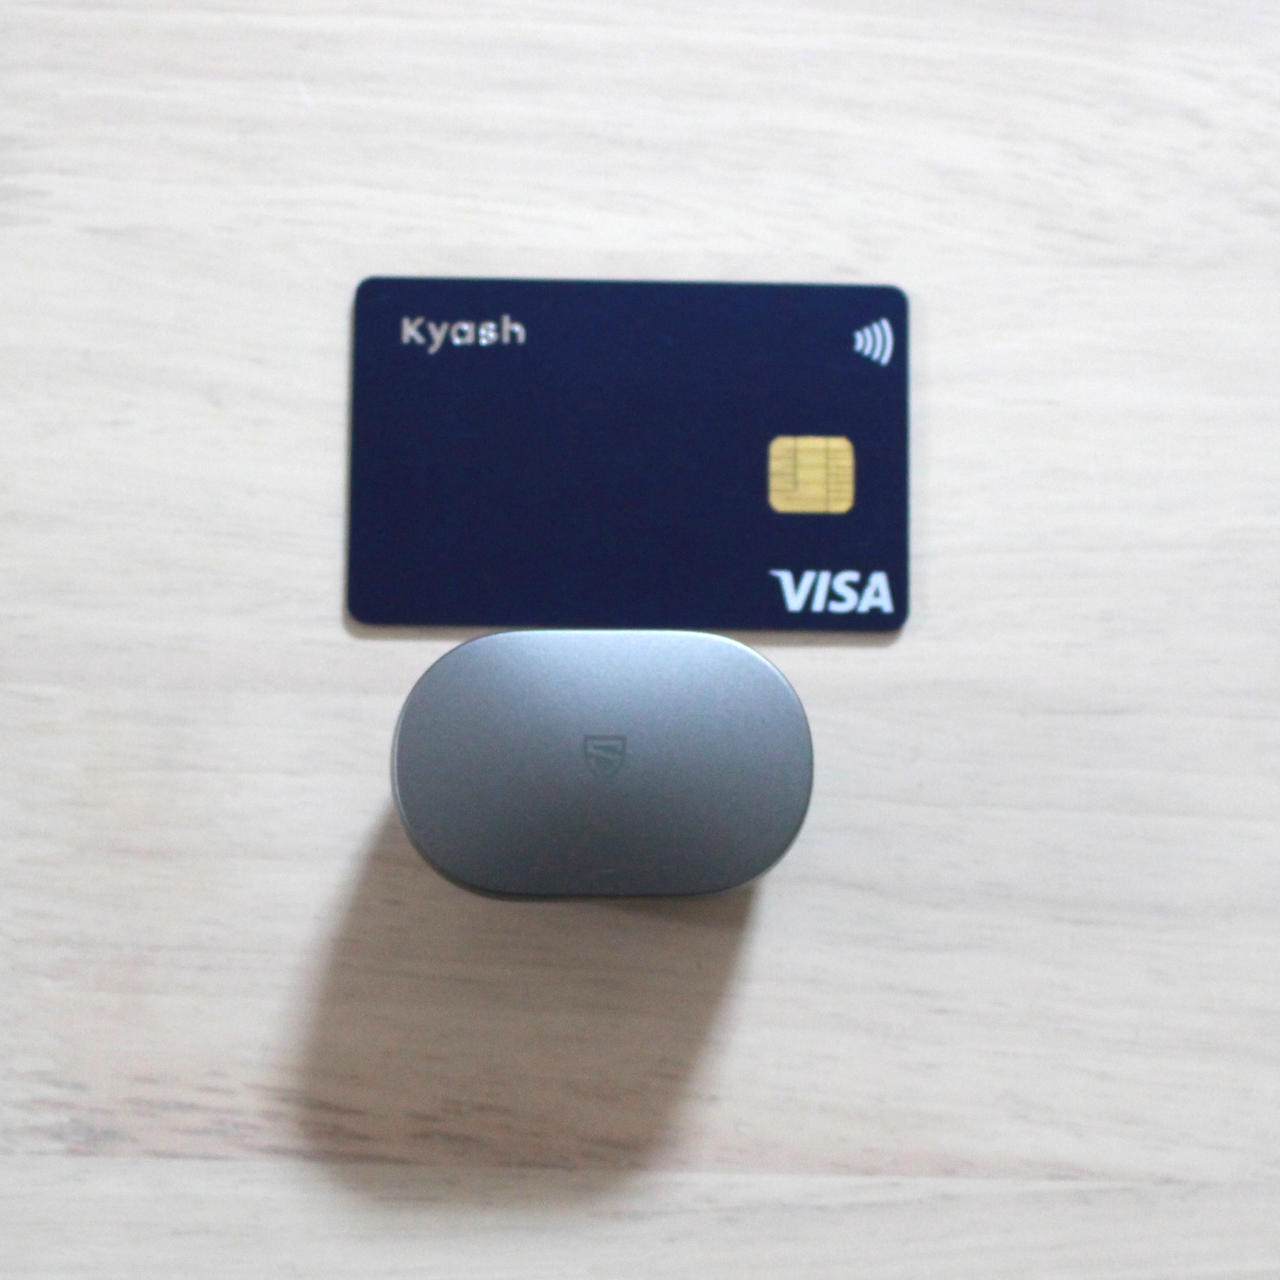 SOUNDPEATS Sonicのケースの大きさはクレジットカードより一回り小さい